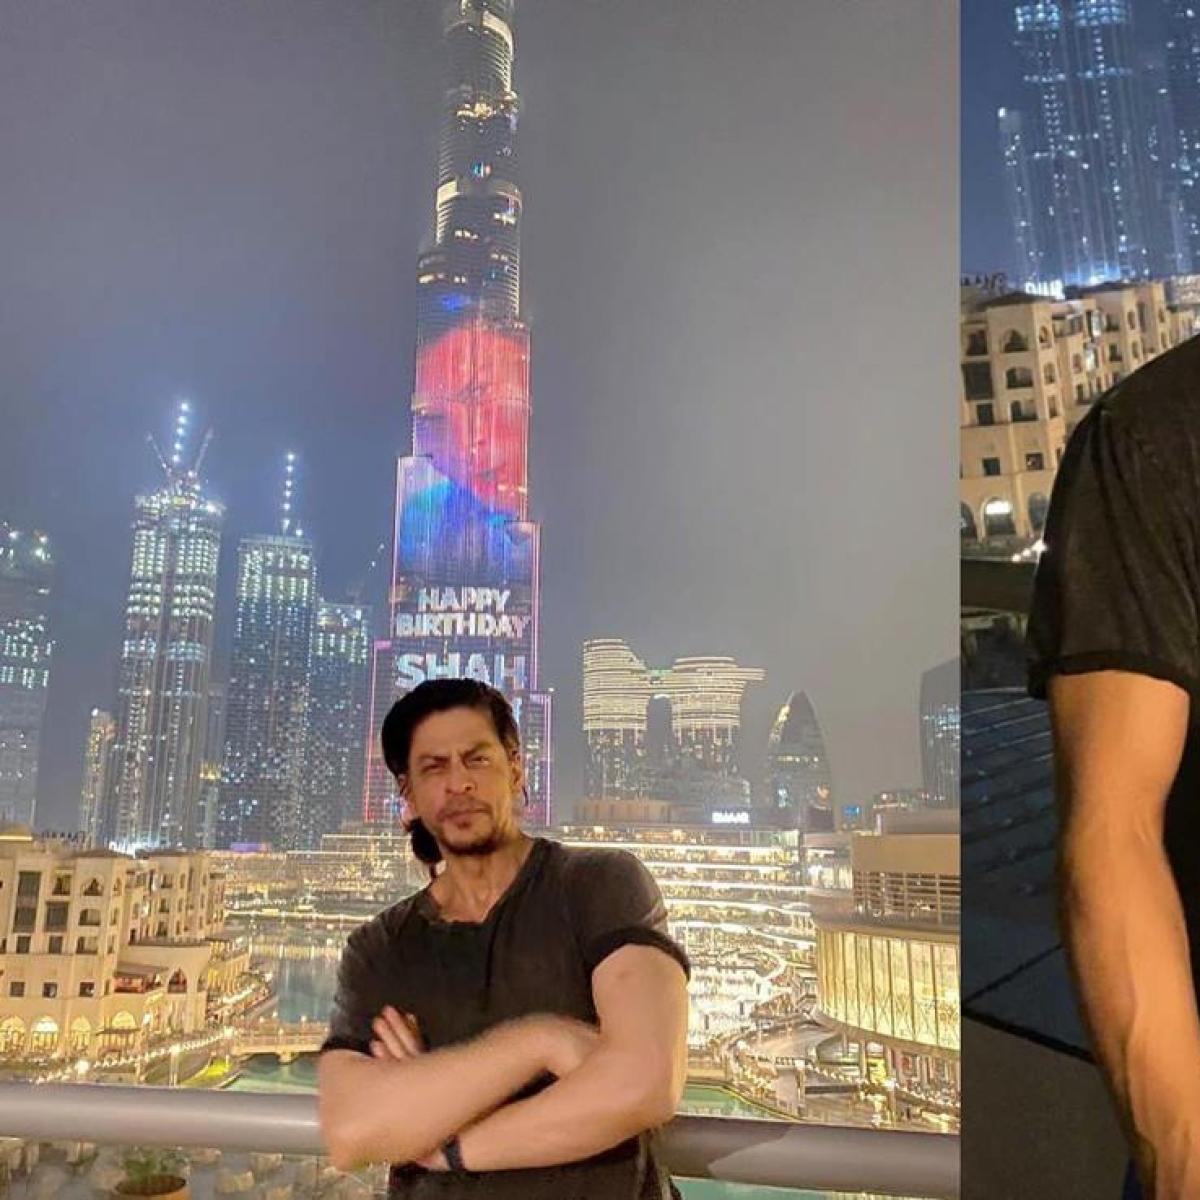 Watch Video: Burj Khalifa pays special tribute to Shah Rukh Khan on his 55th birthday